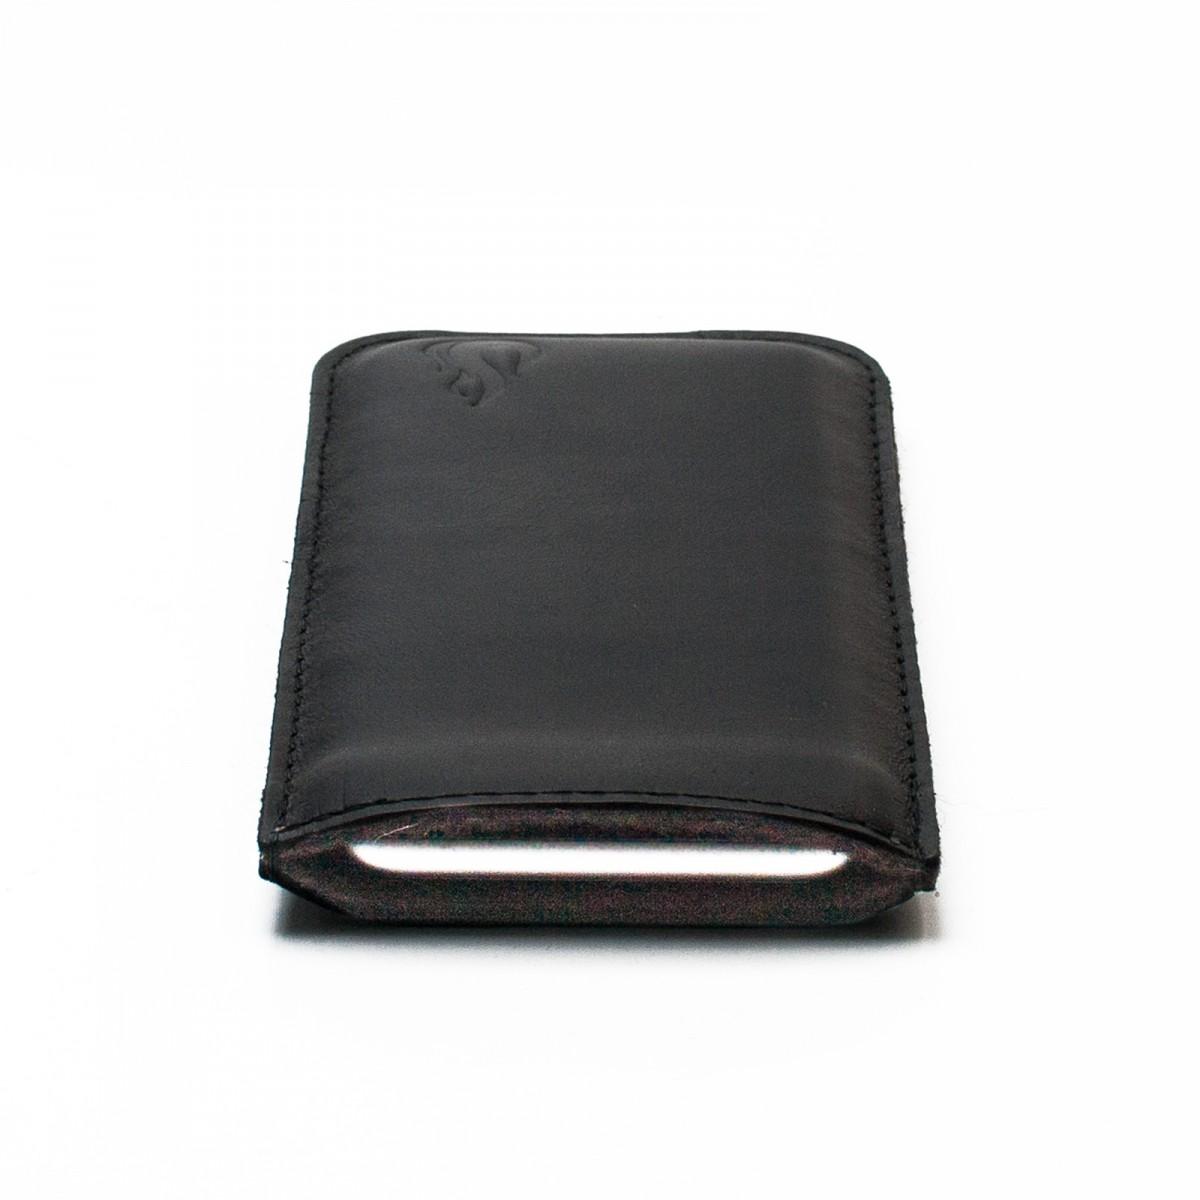 Love Leather iPhone 6 / iPhone 7 - black (Leder)